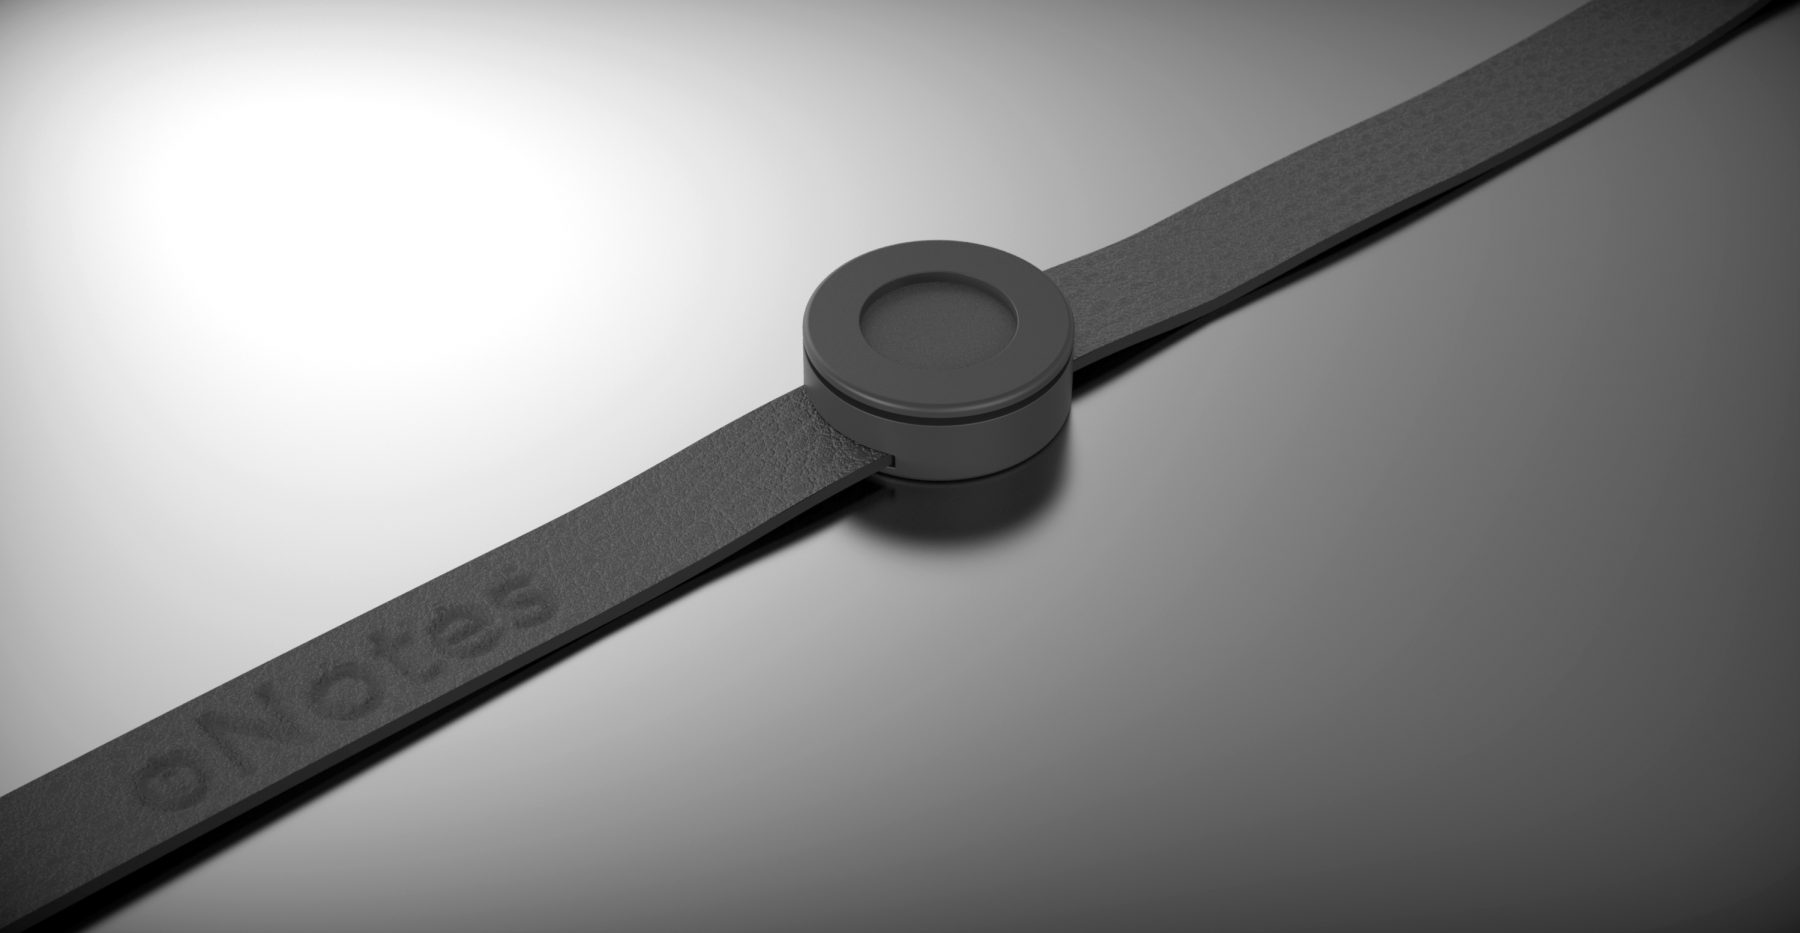 onote2_bracelet_pose_bold-design